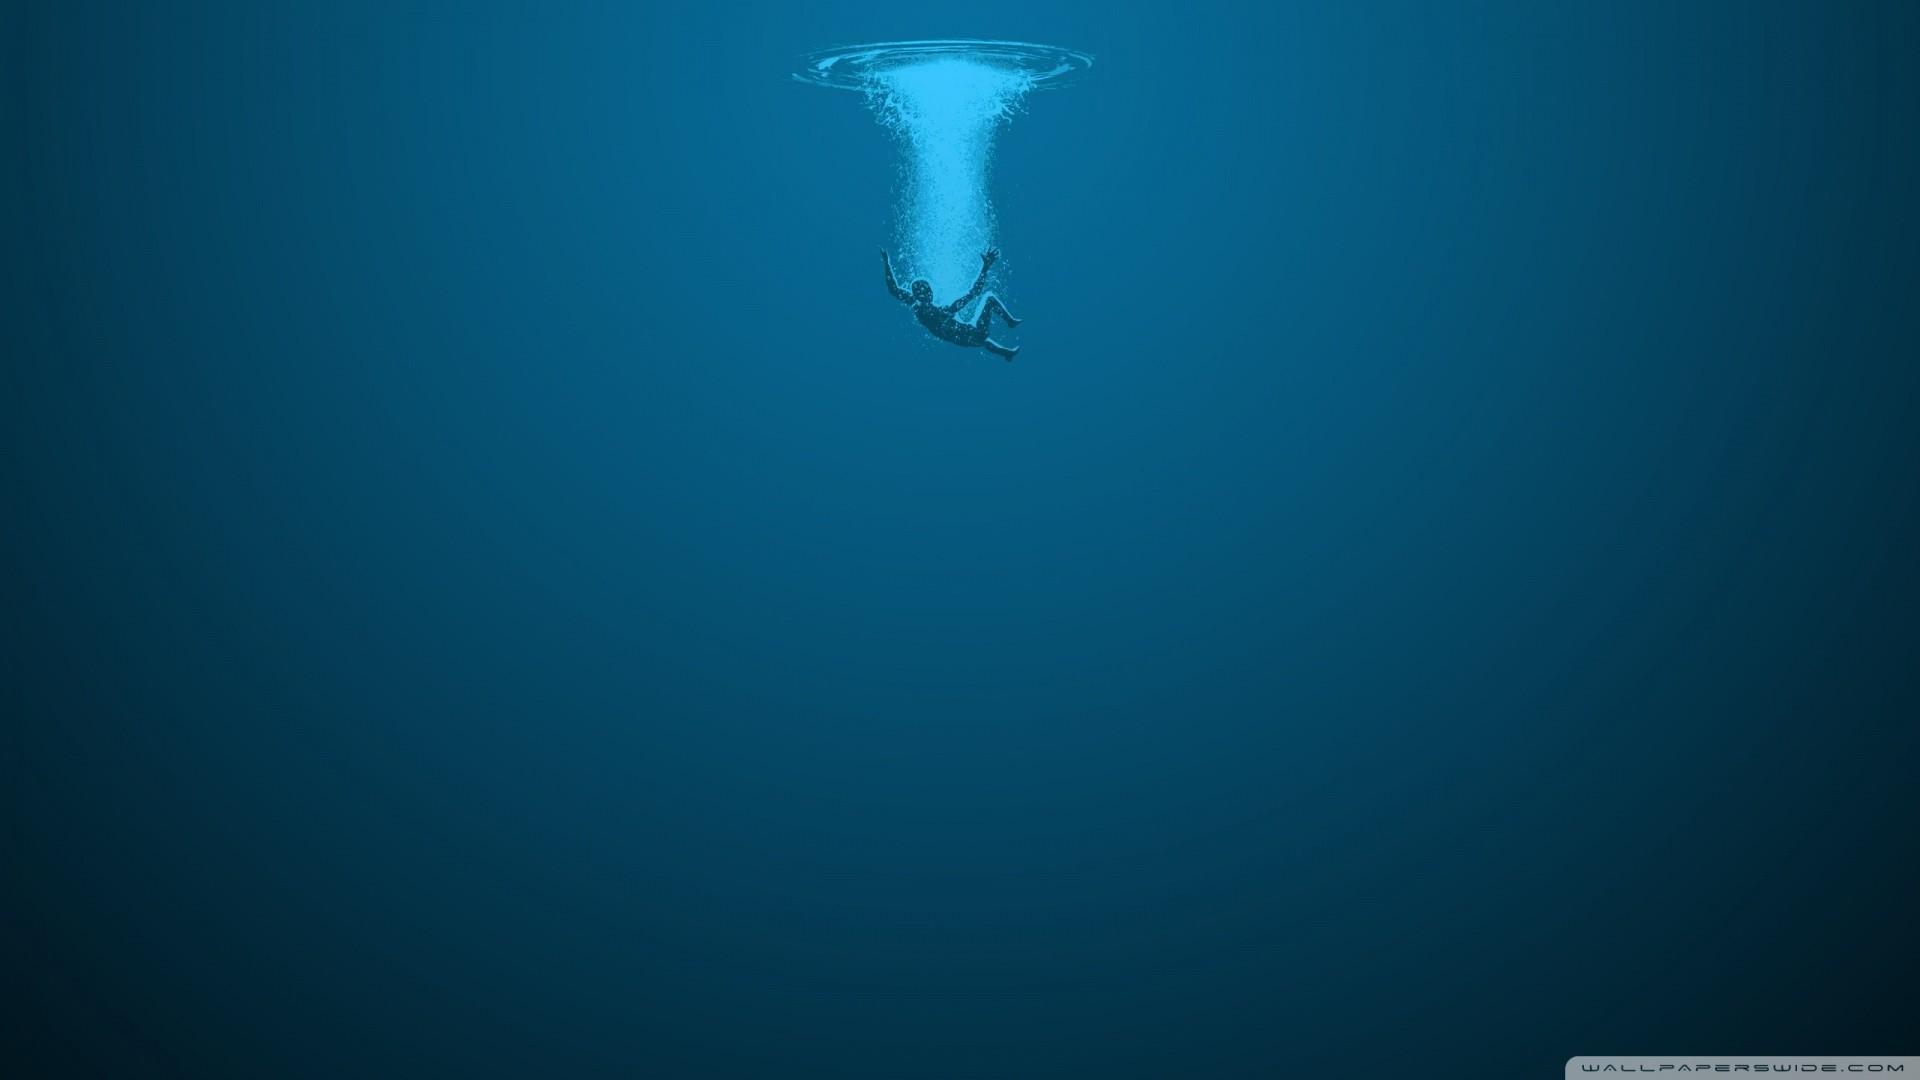 1920x1080 Deep Underwater Wallpaper Hd